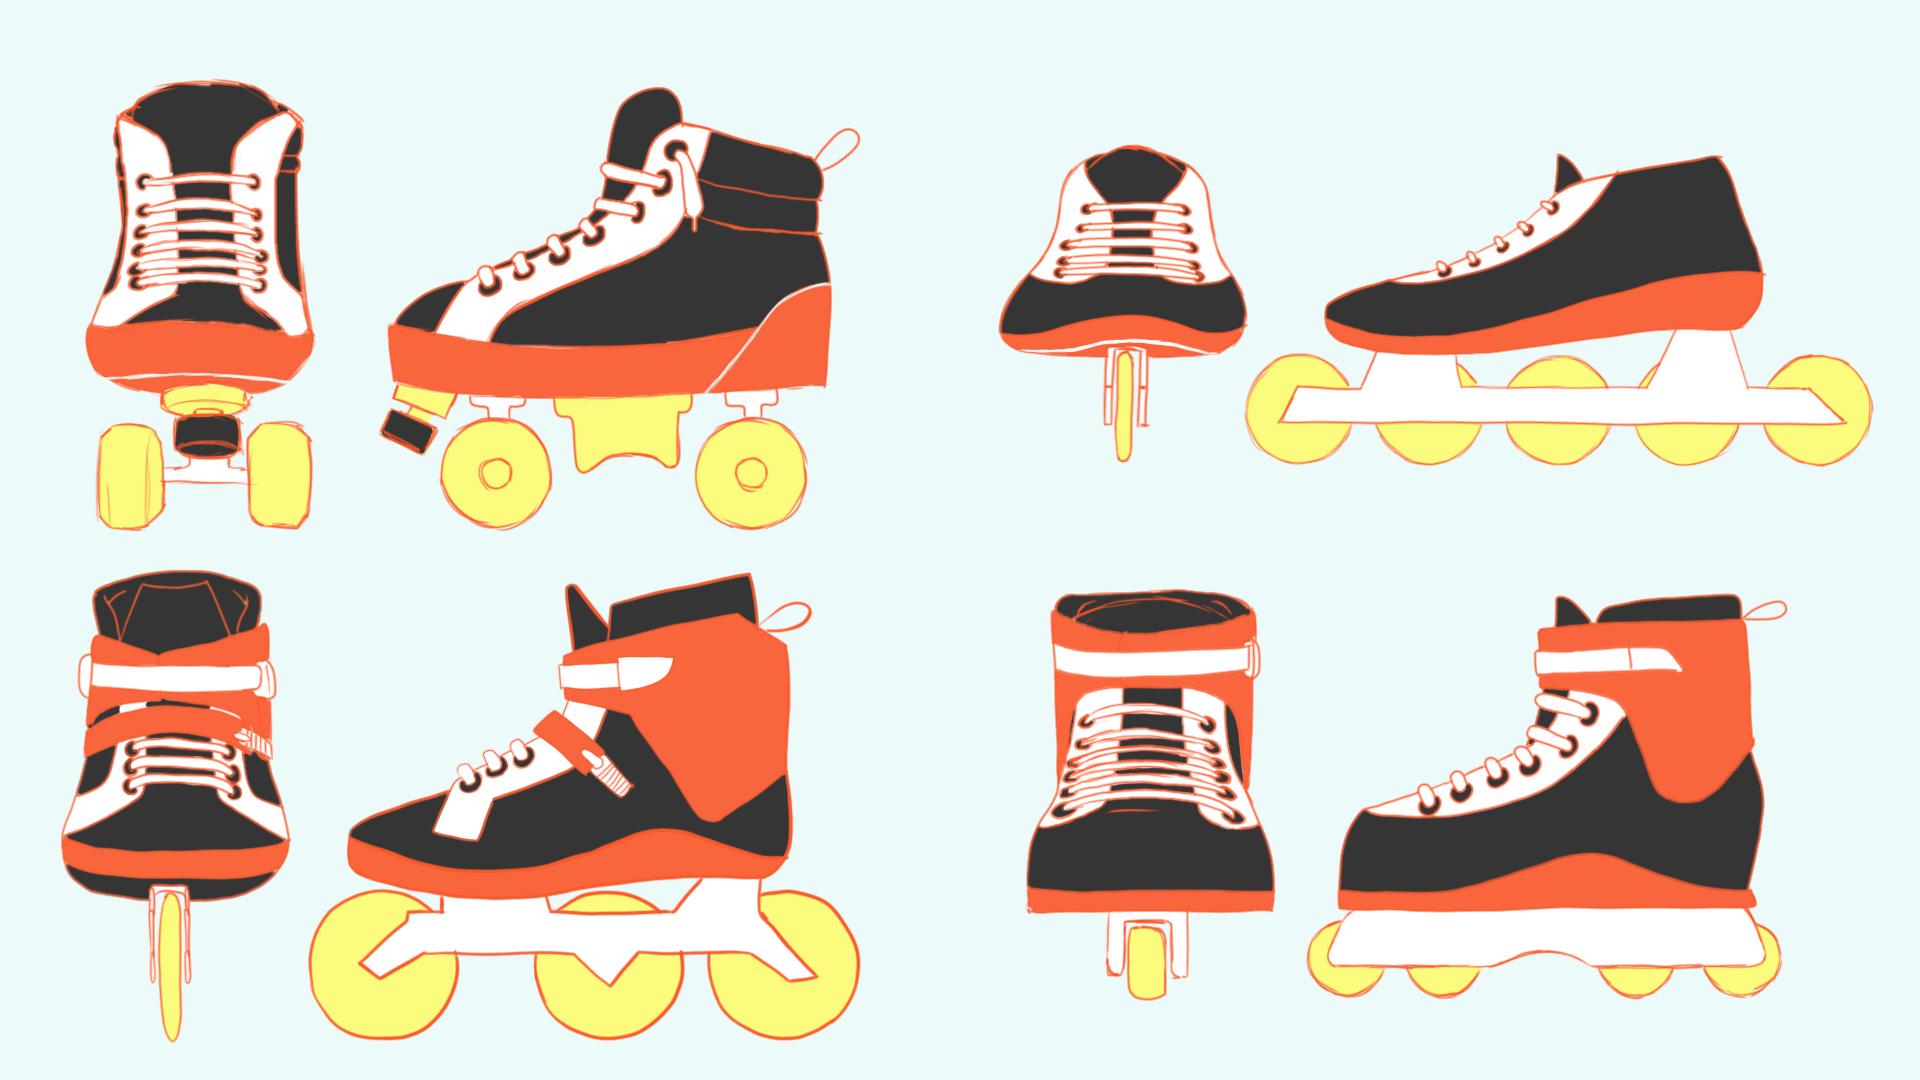 concept_skates.png